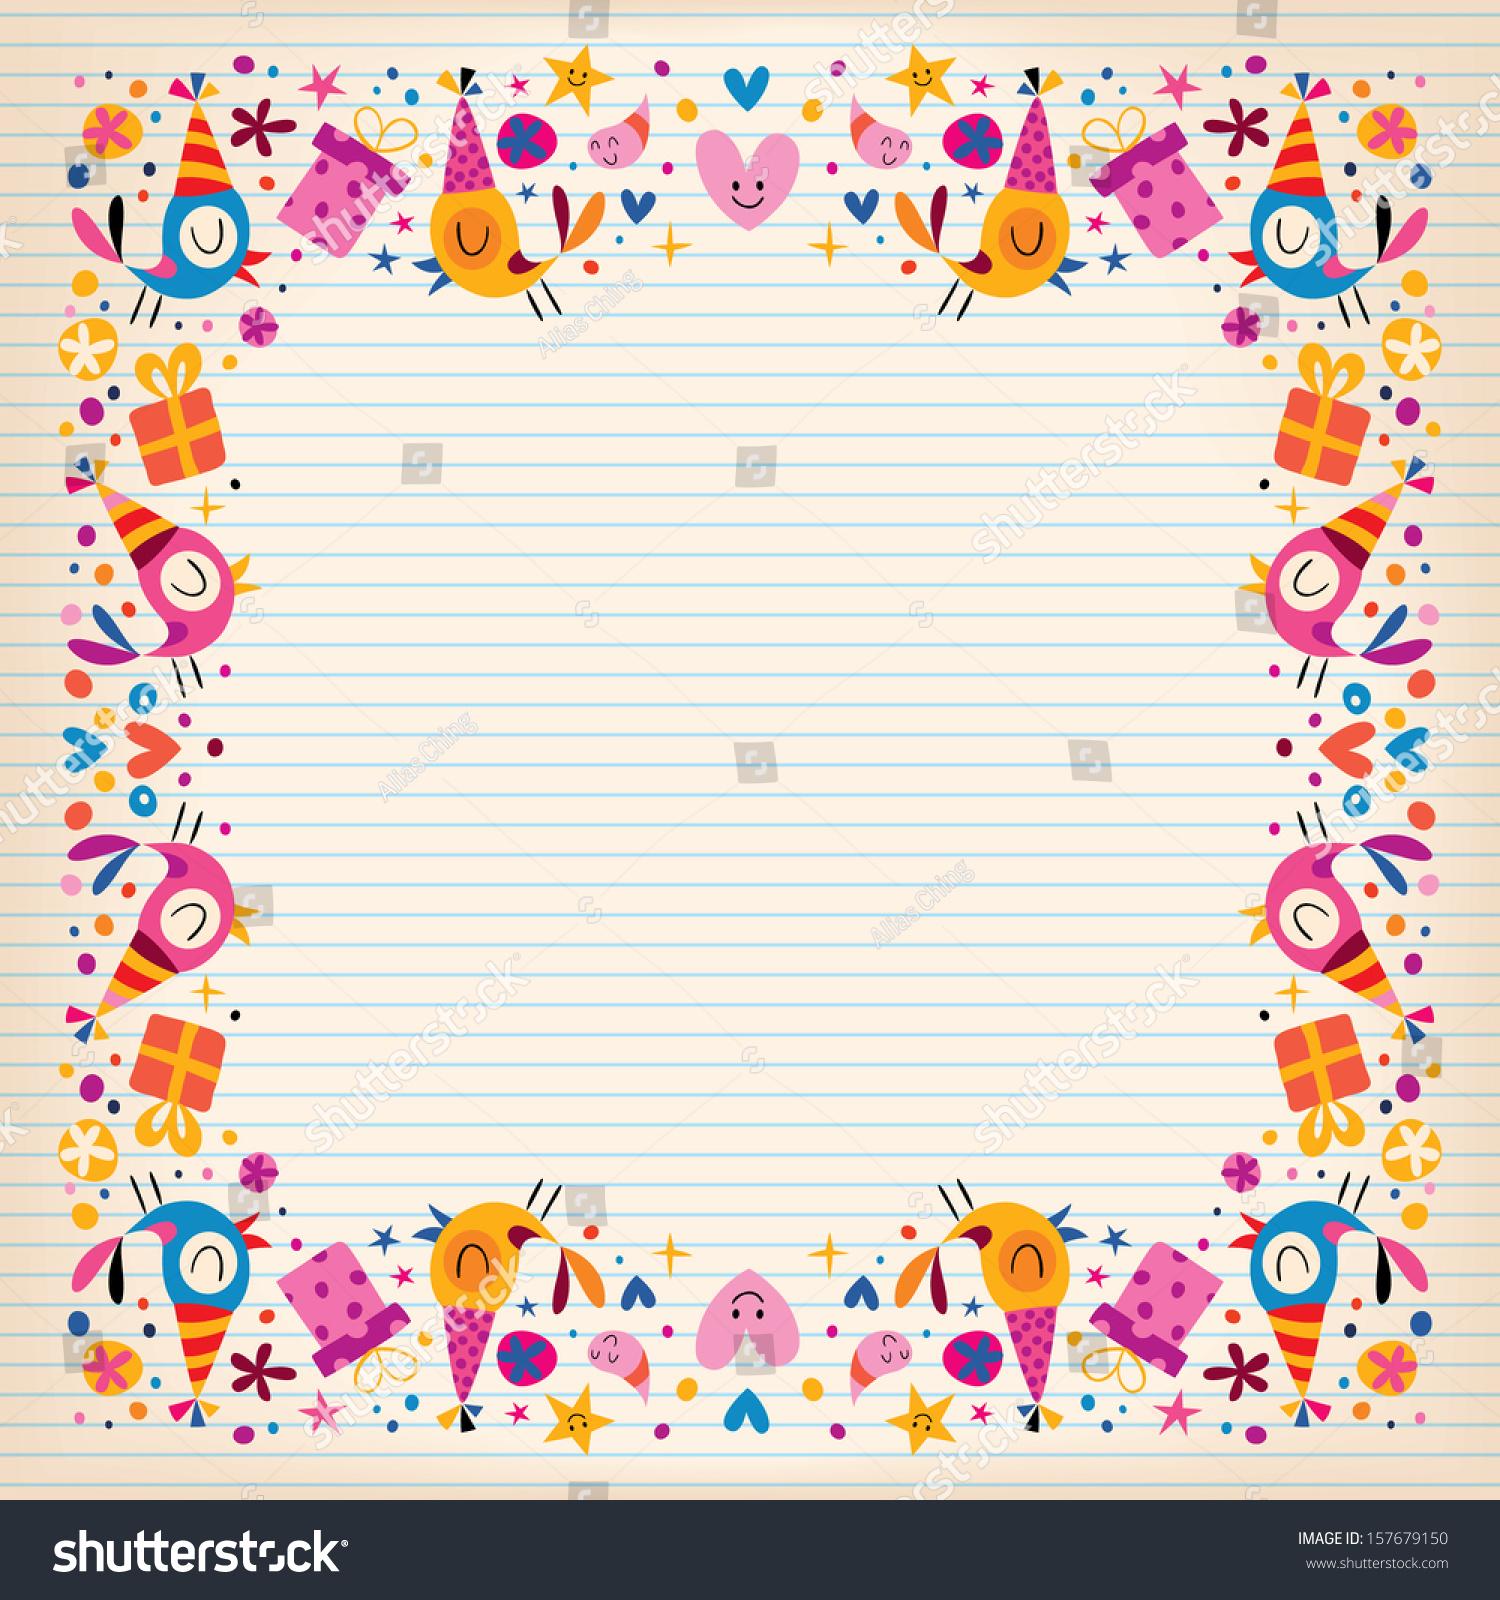 Border paper writing – Border Paper Template